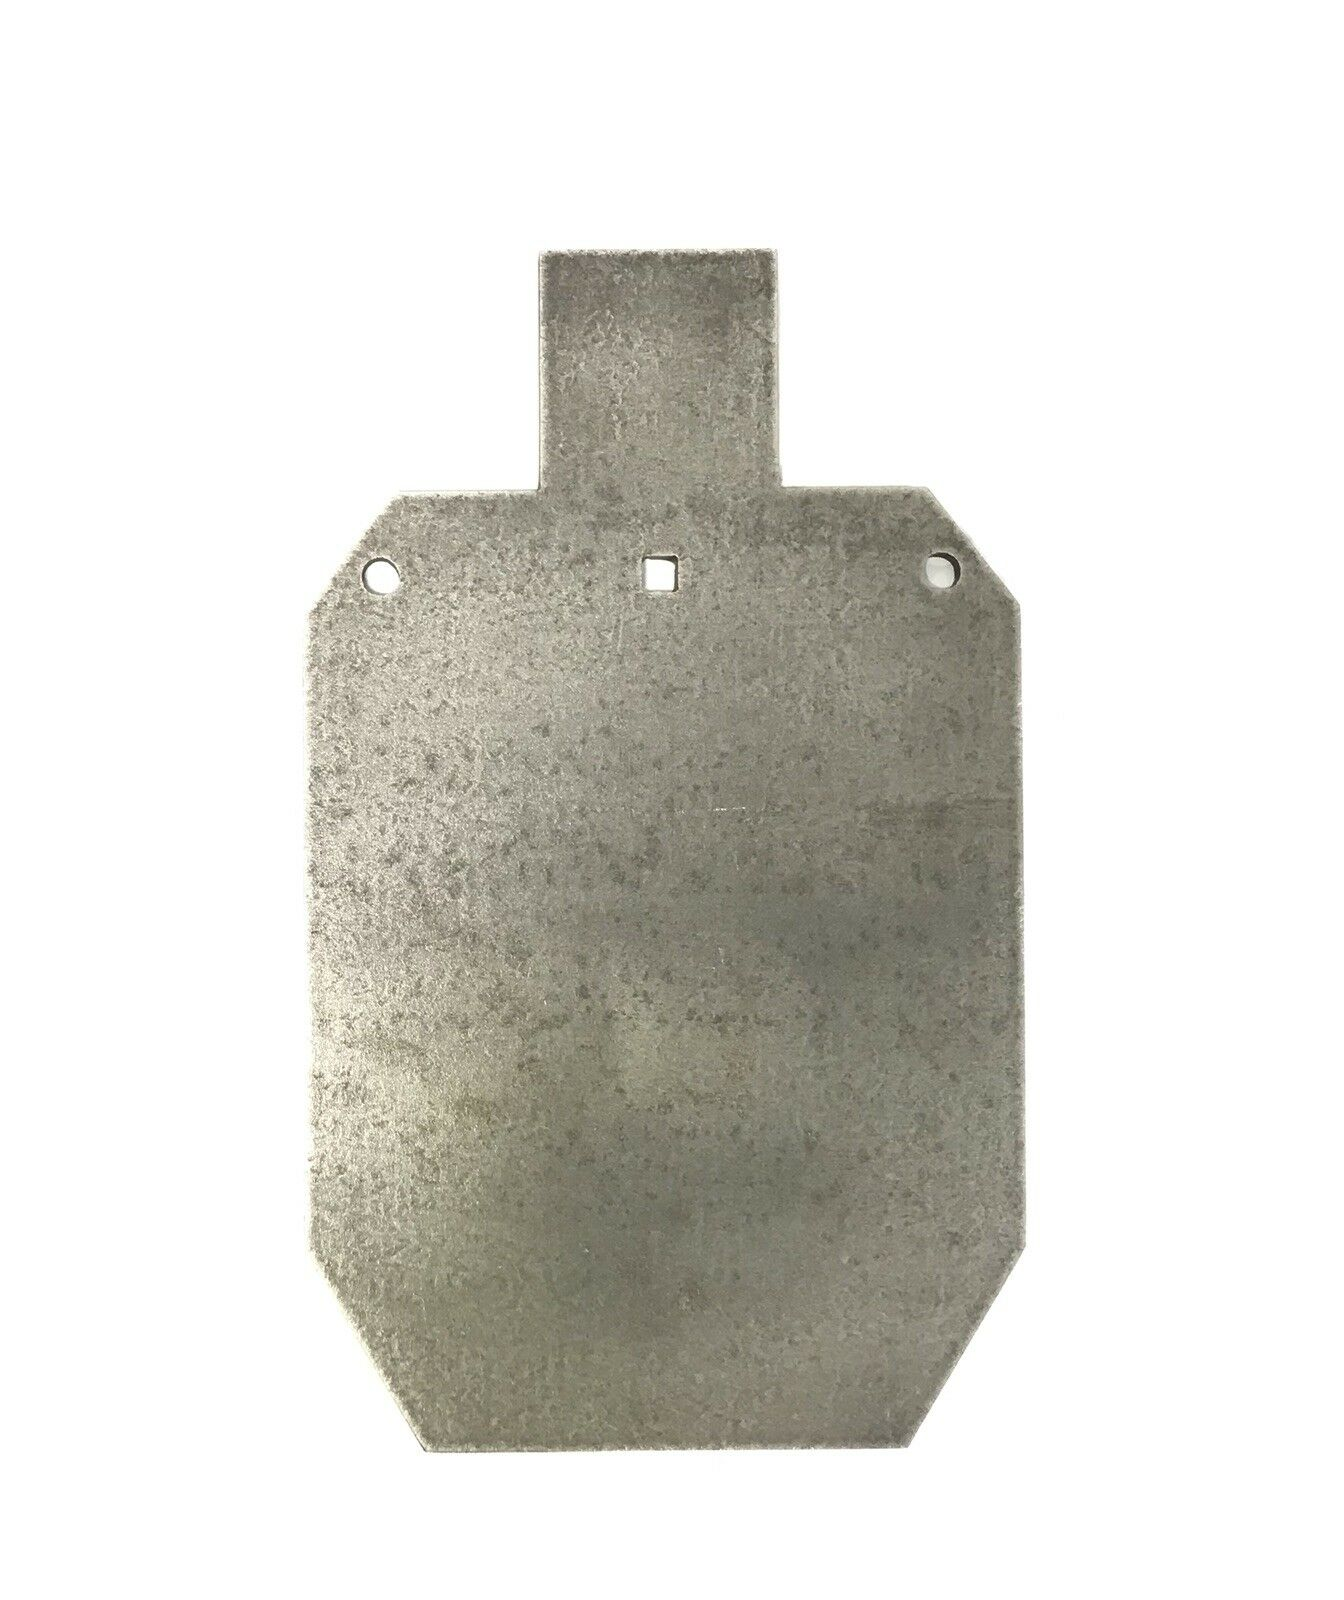 "AR500 2/3 IDPA IPSC Steel Shooting Target Gong 5/8""X 12""X 12""X 5/8""X 20"" 79562b"